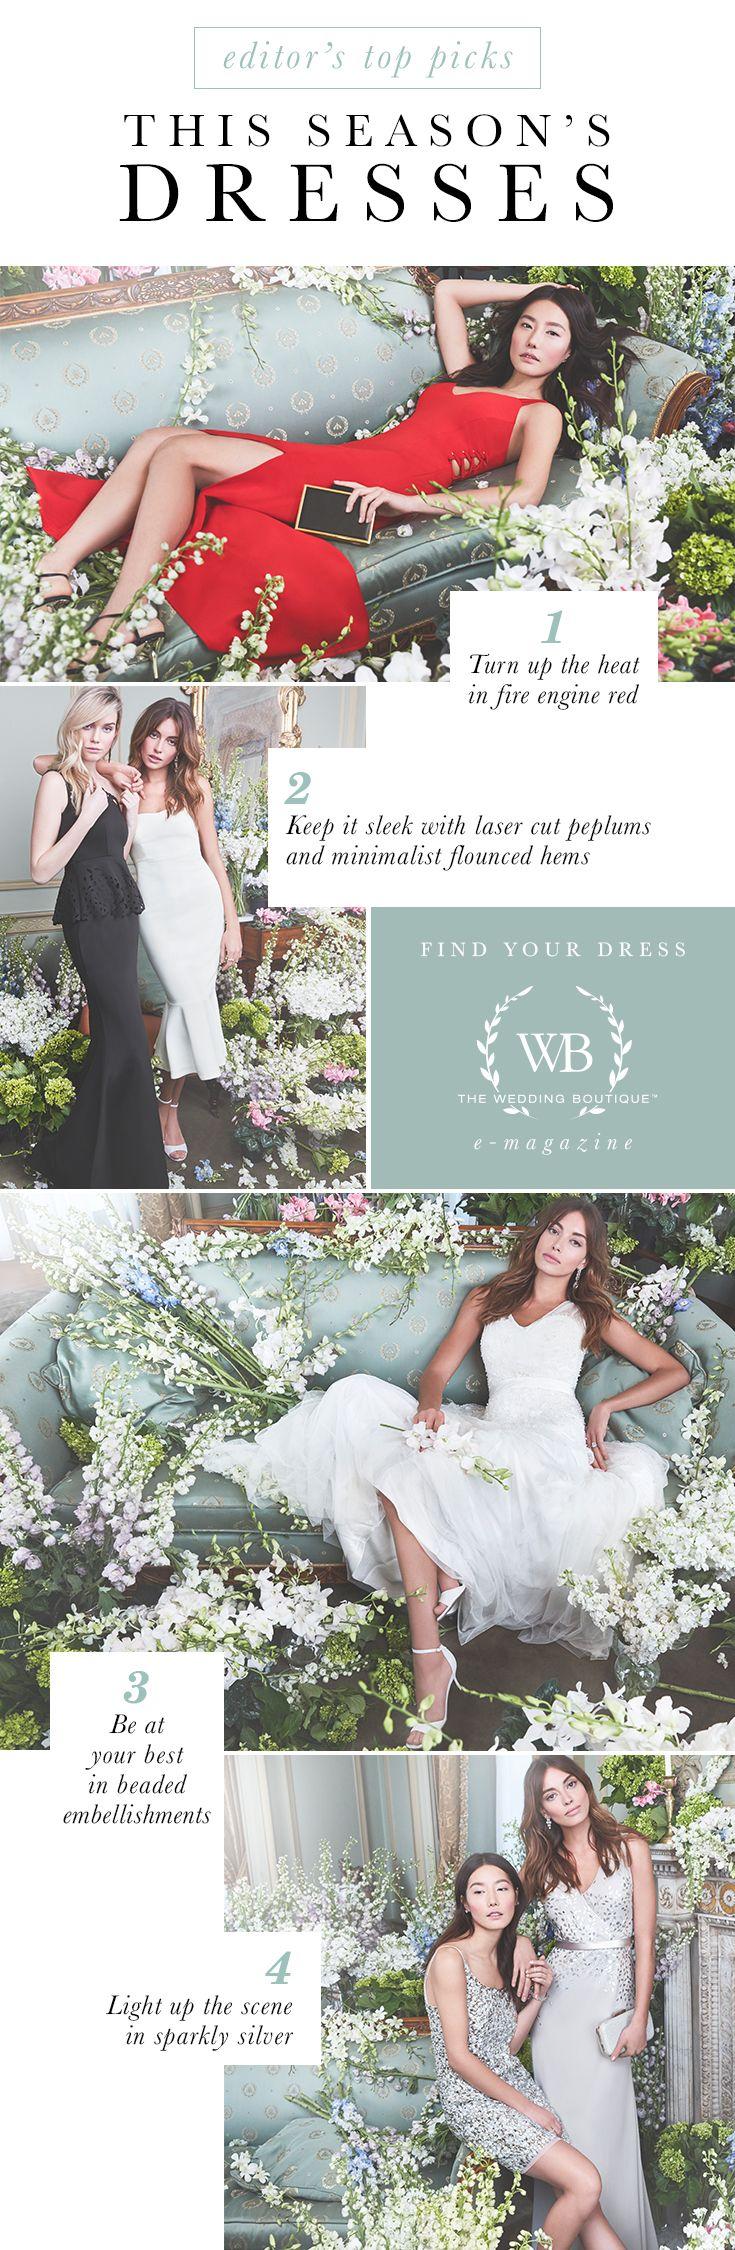 This Season's Top Dresses | The Wedding Boutique Magazine by LE CHÂTEAU